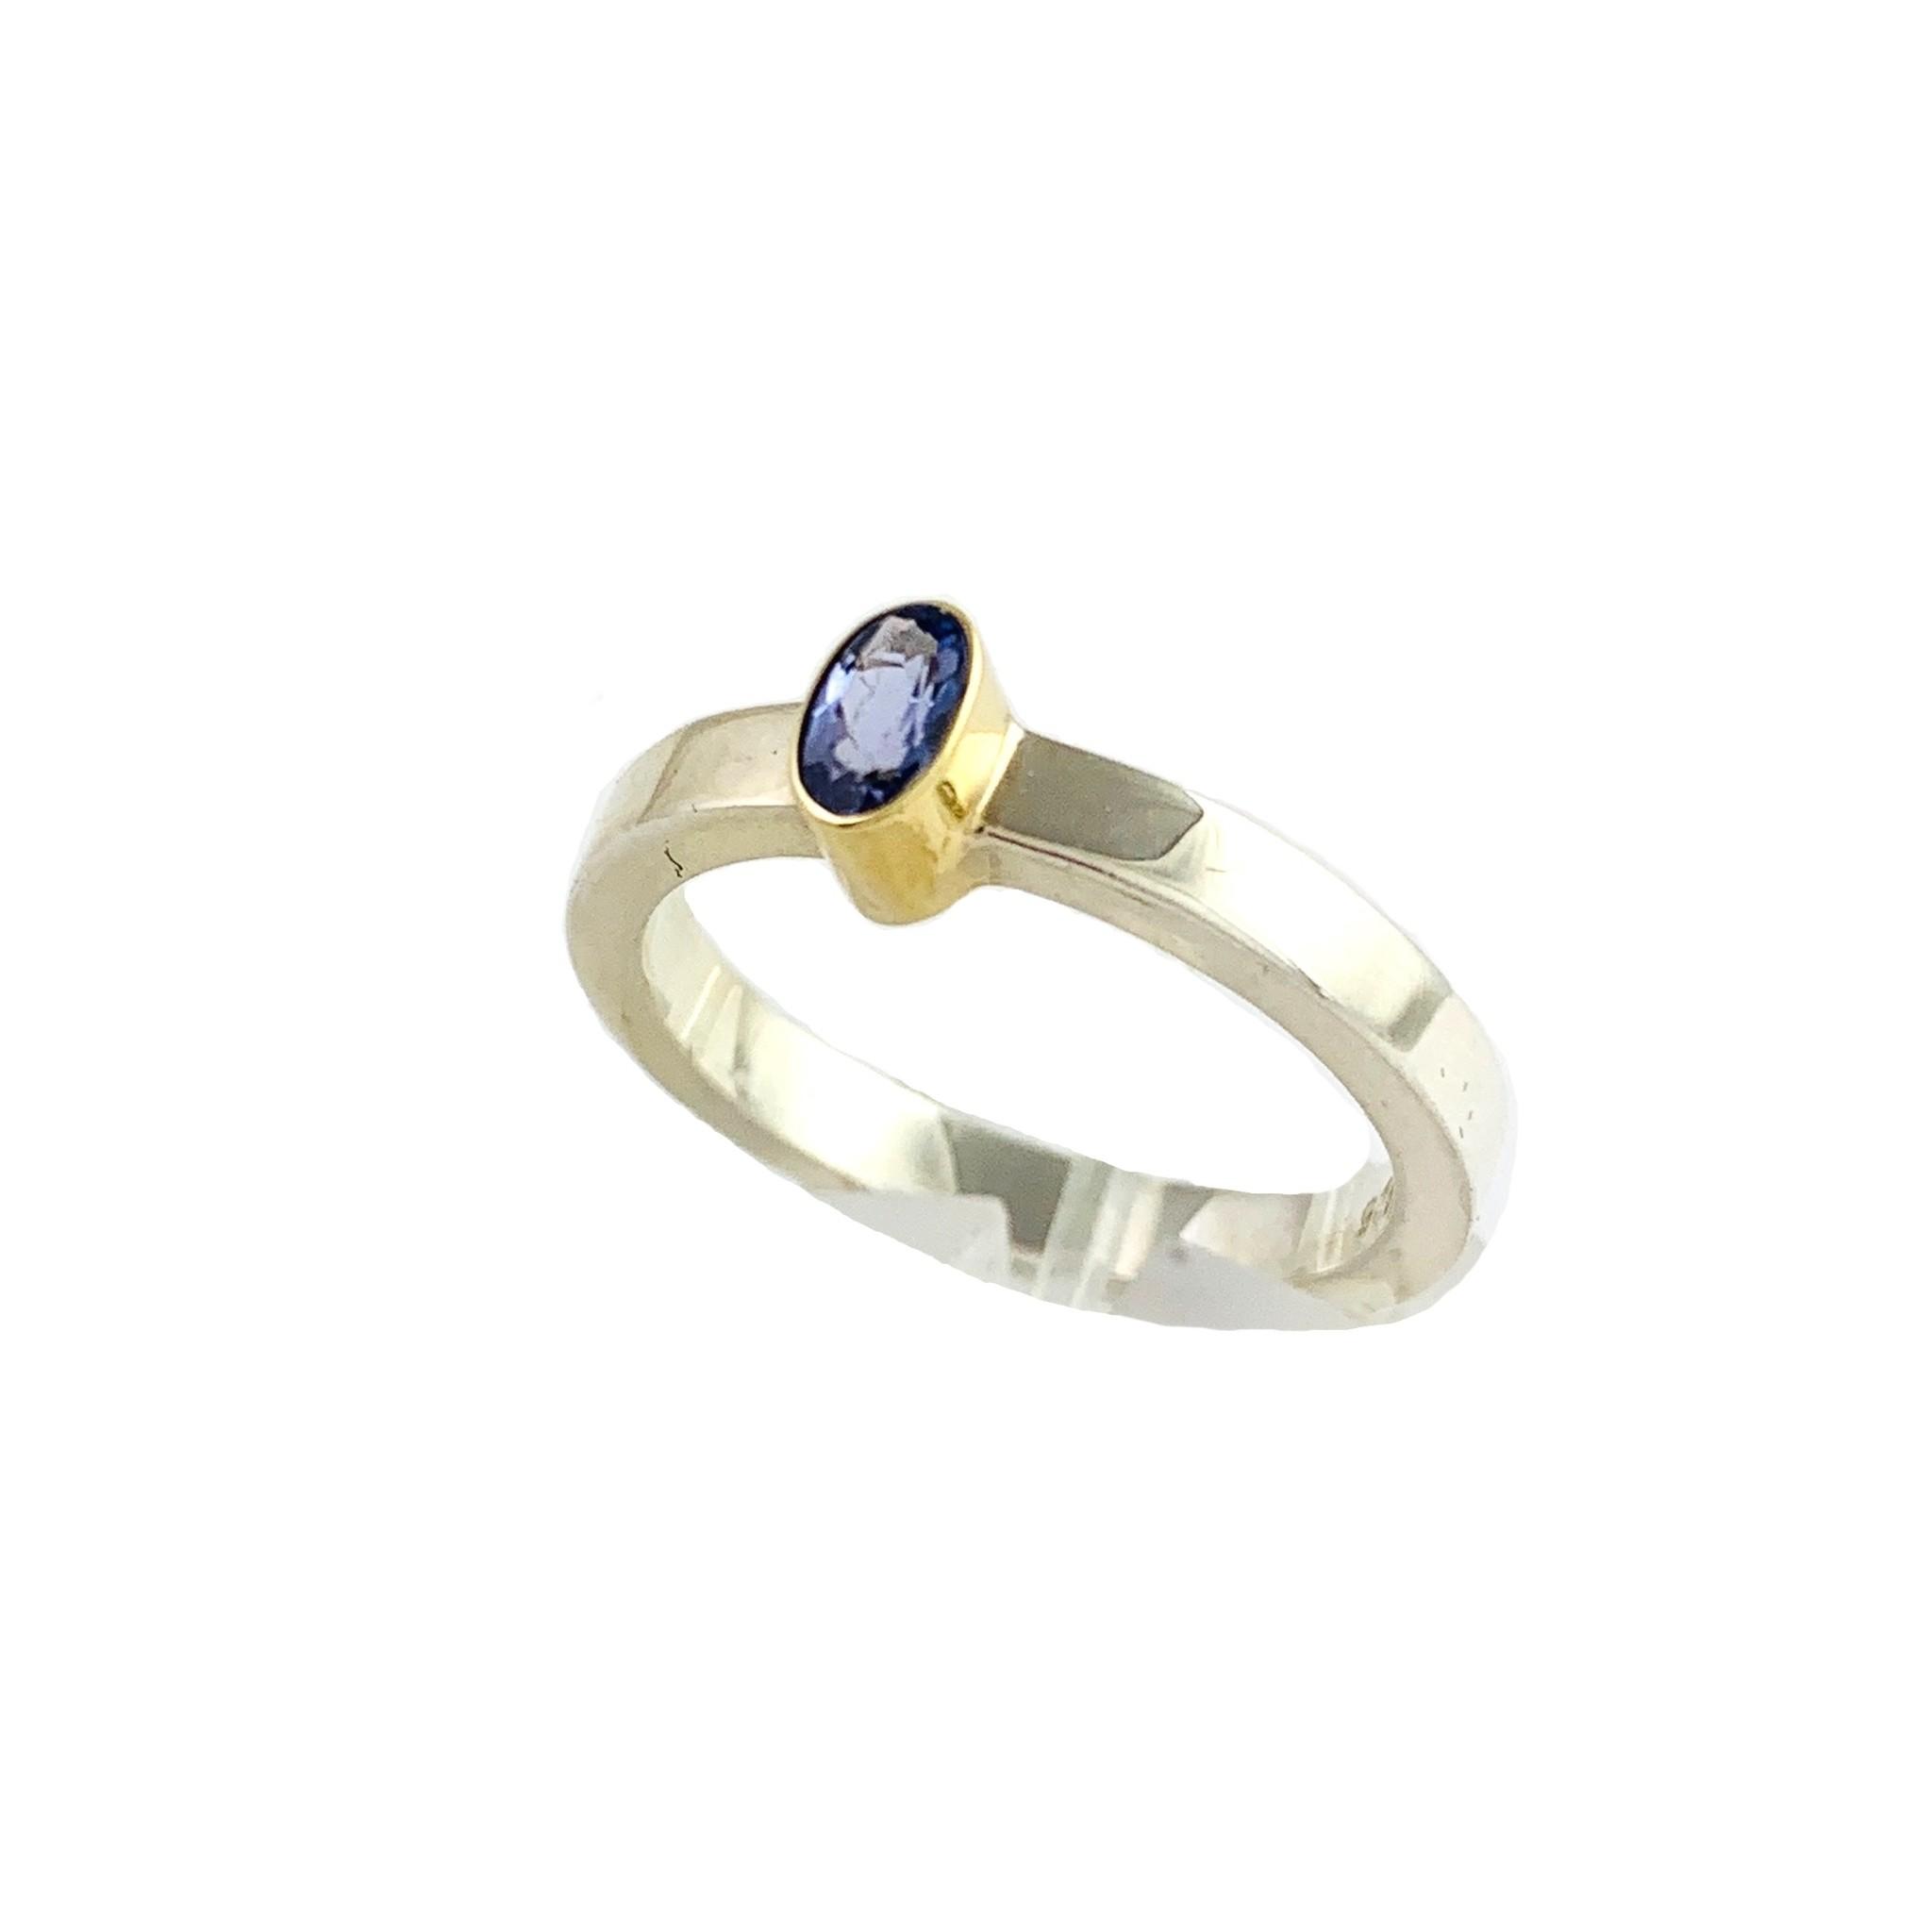 Kiliaan collectie Ring tanzanite - silver gold